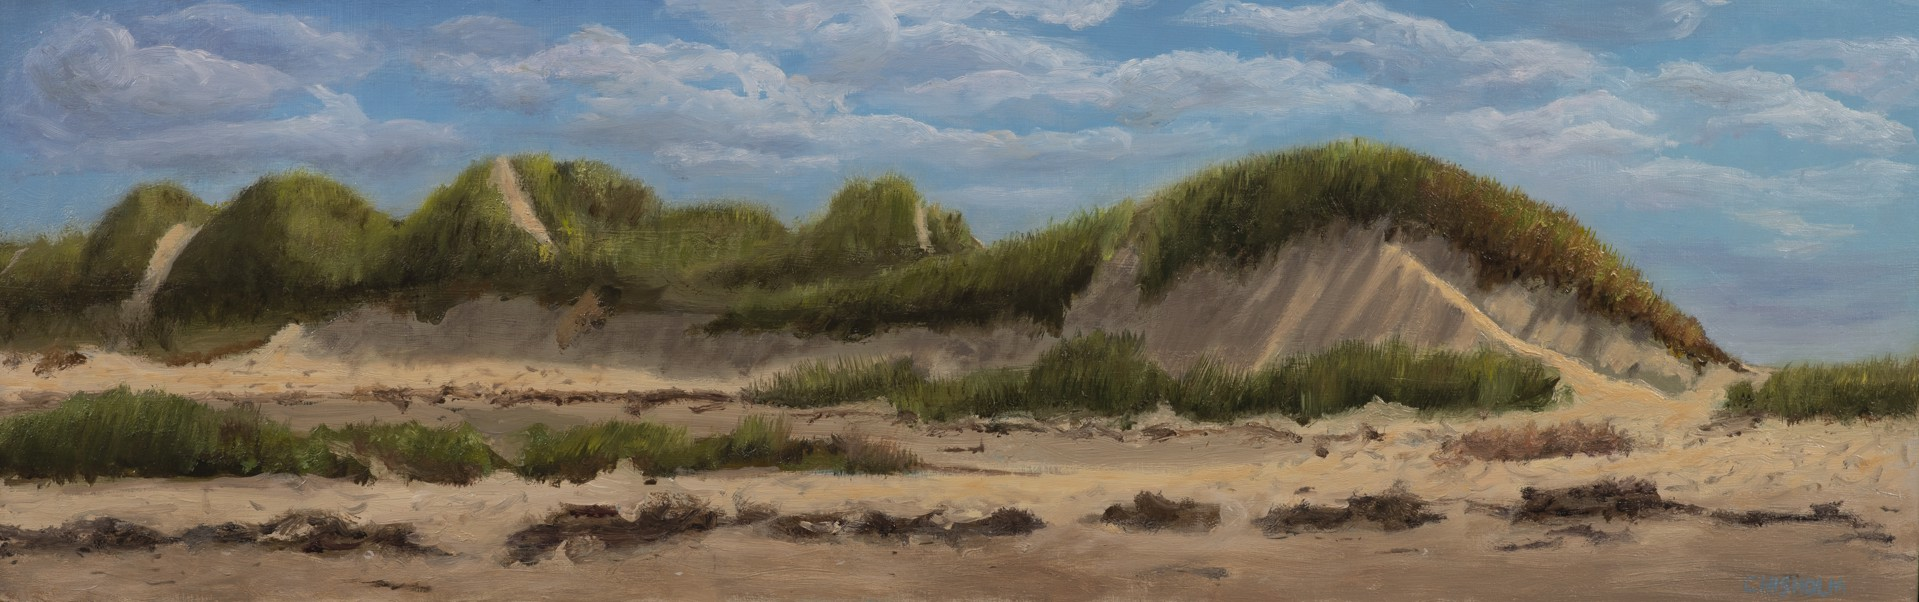 Dune Portrait by Bill Chisholm